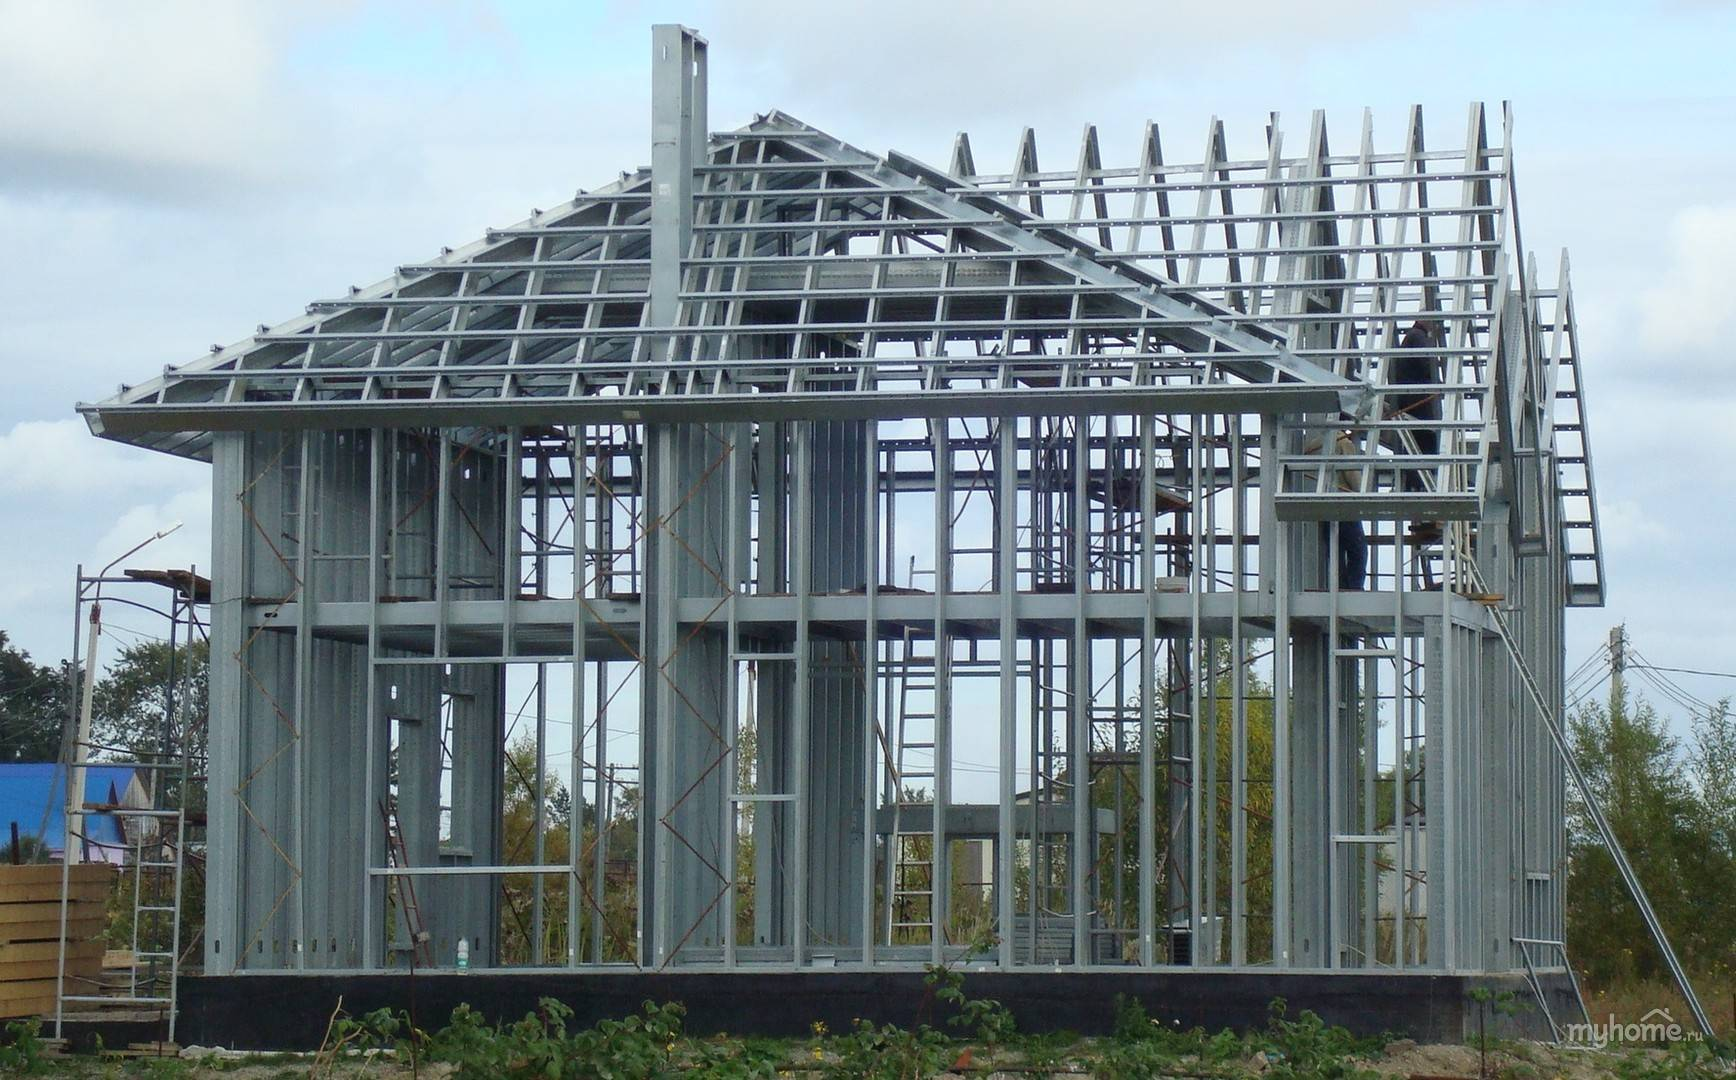 Строительство домов под ключ по технологии лстк